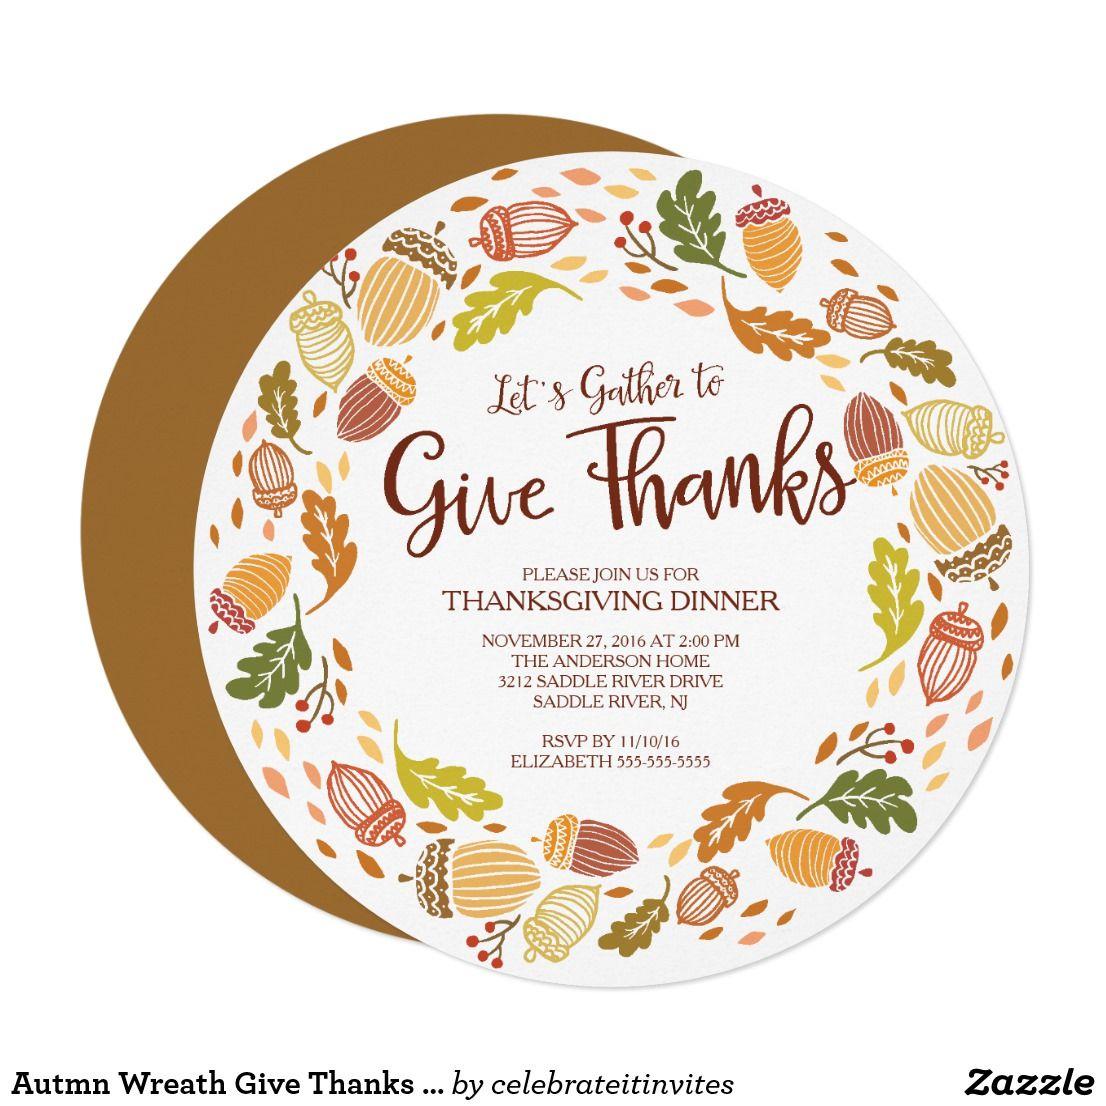 Autmn Wreath Give Thanks Thanksgiving Dinner Invitation Zazzle Com Thanksgiving Dinner Invitation Dinner Invitations Thanksgiving Invitation